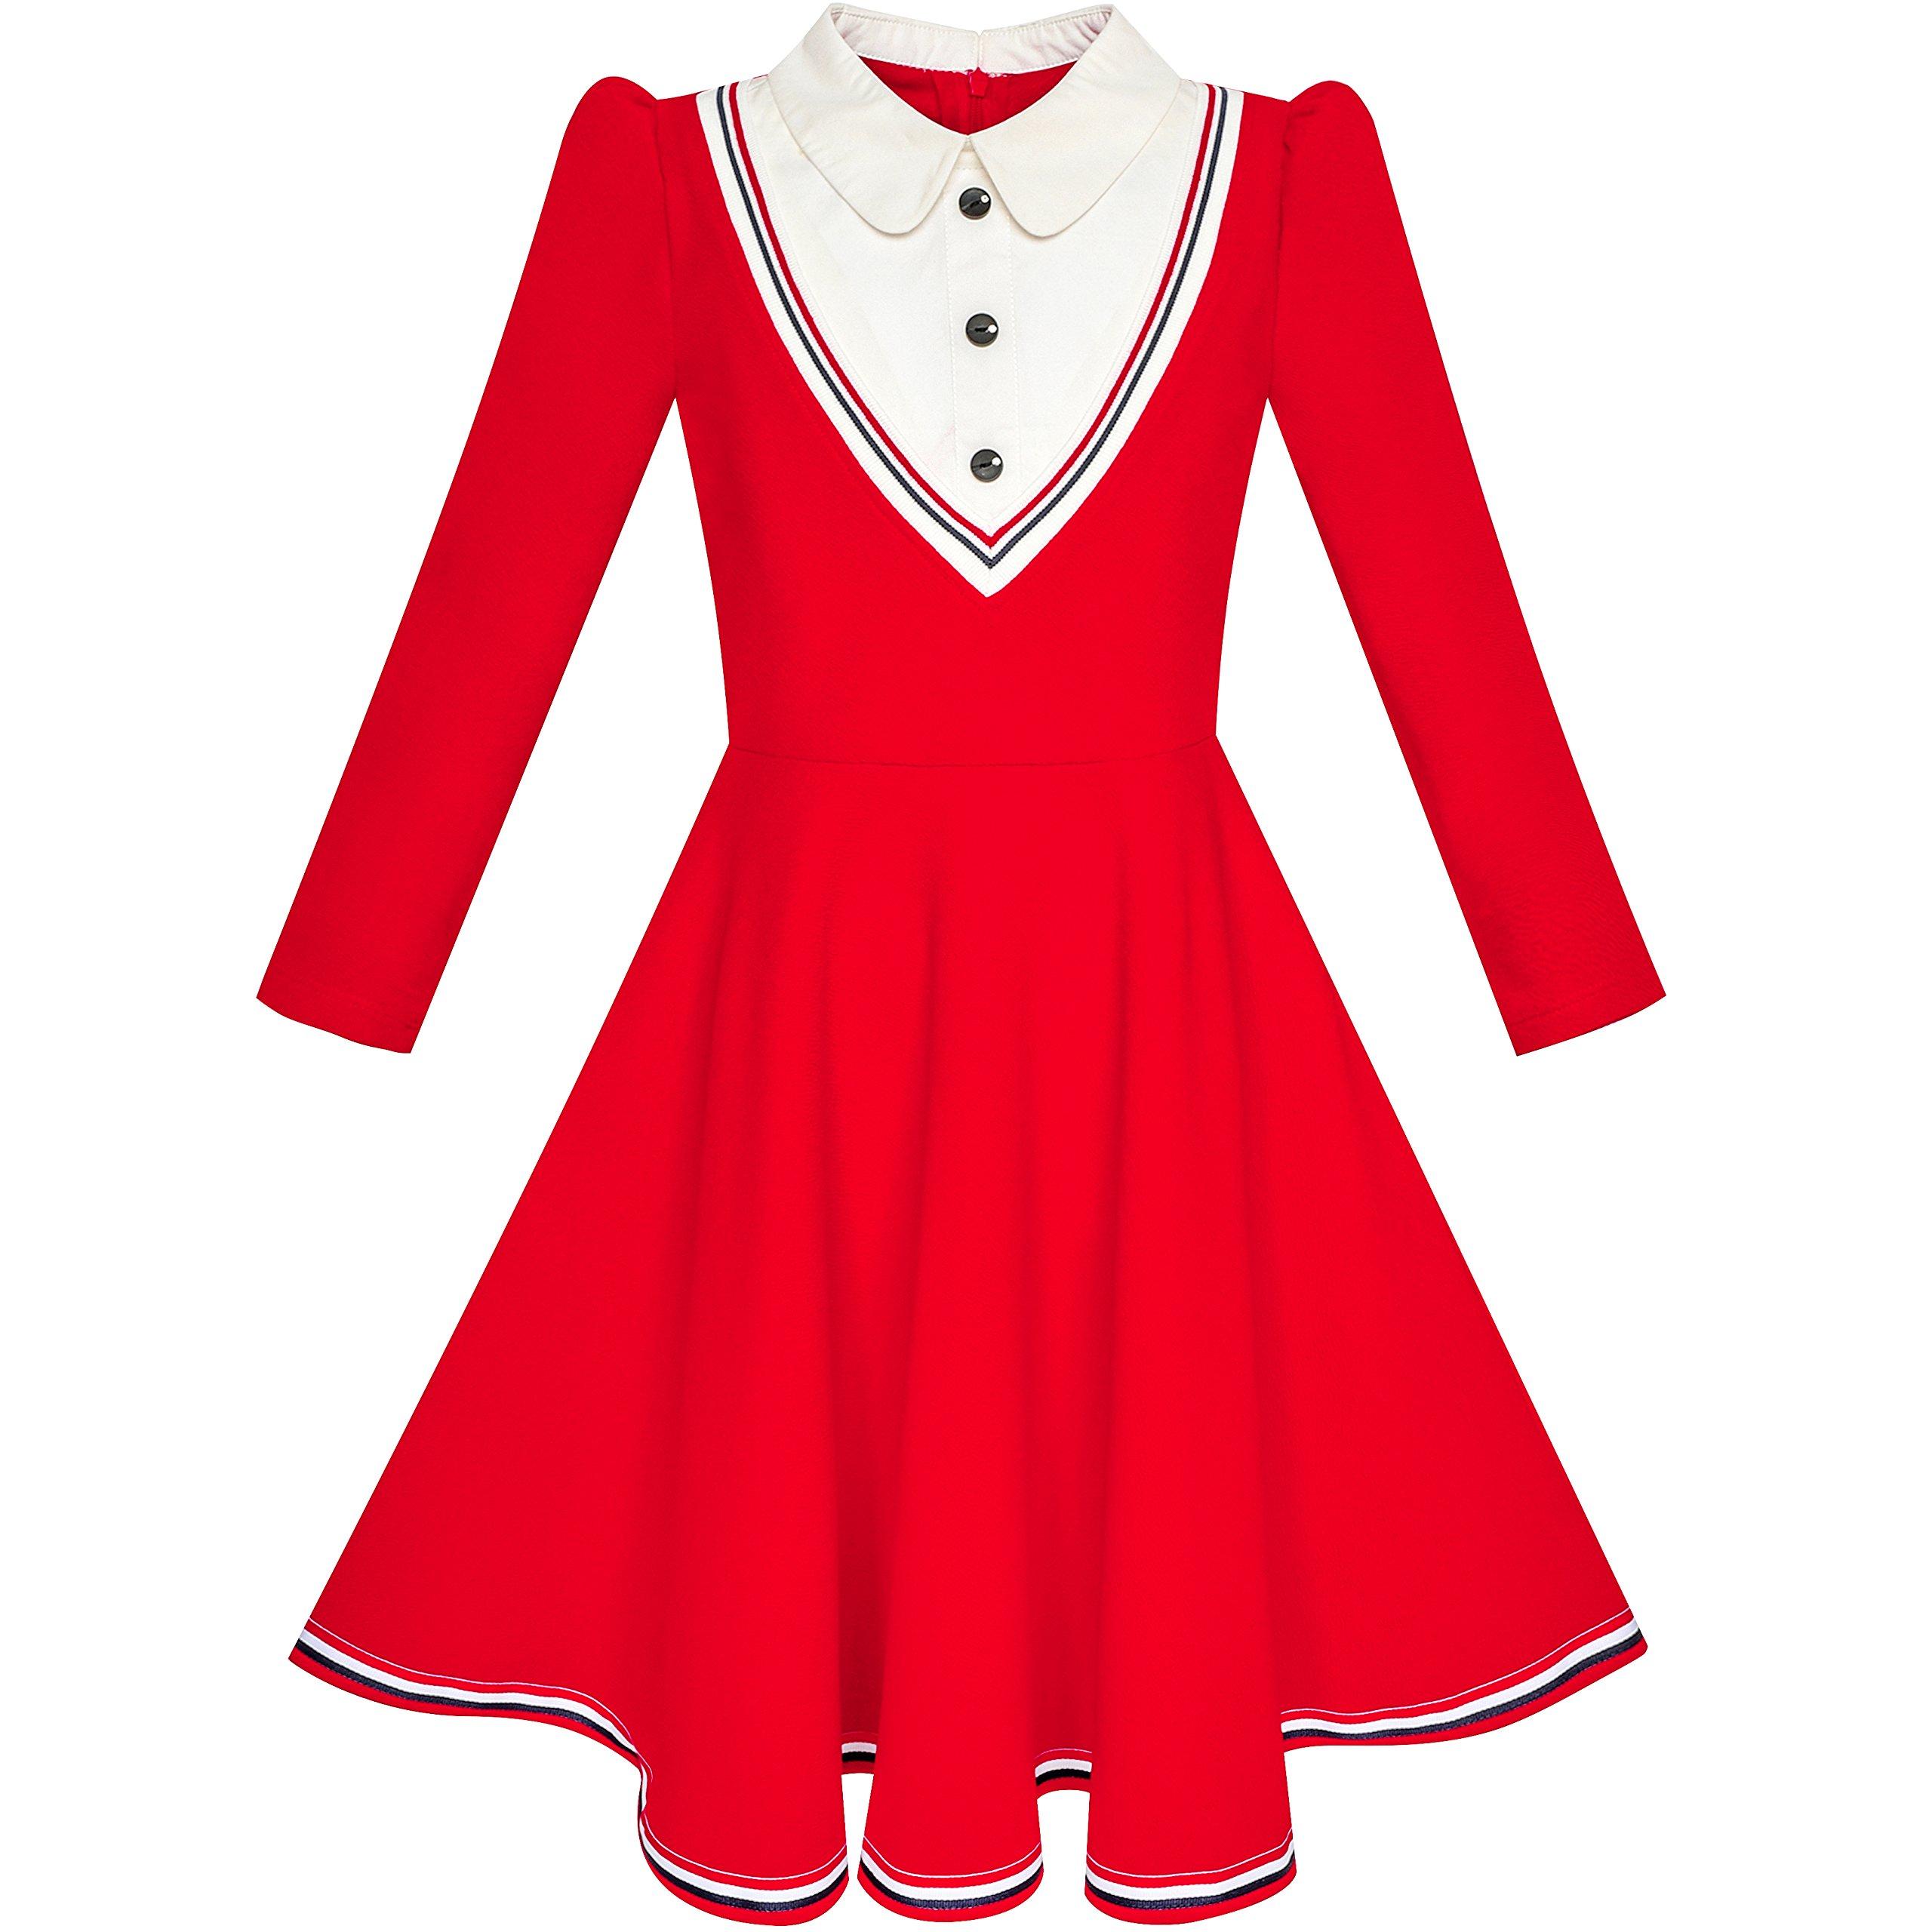 Sunny Fashion LP66 Girls Dress School White Collar Red Long Sleeve Striped Size 10